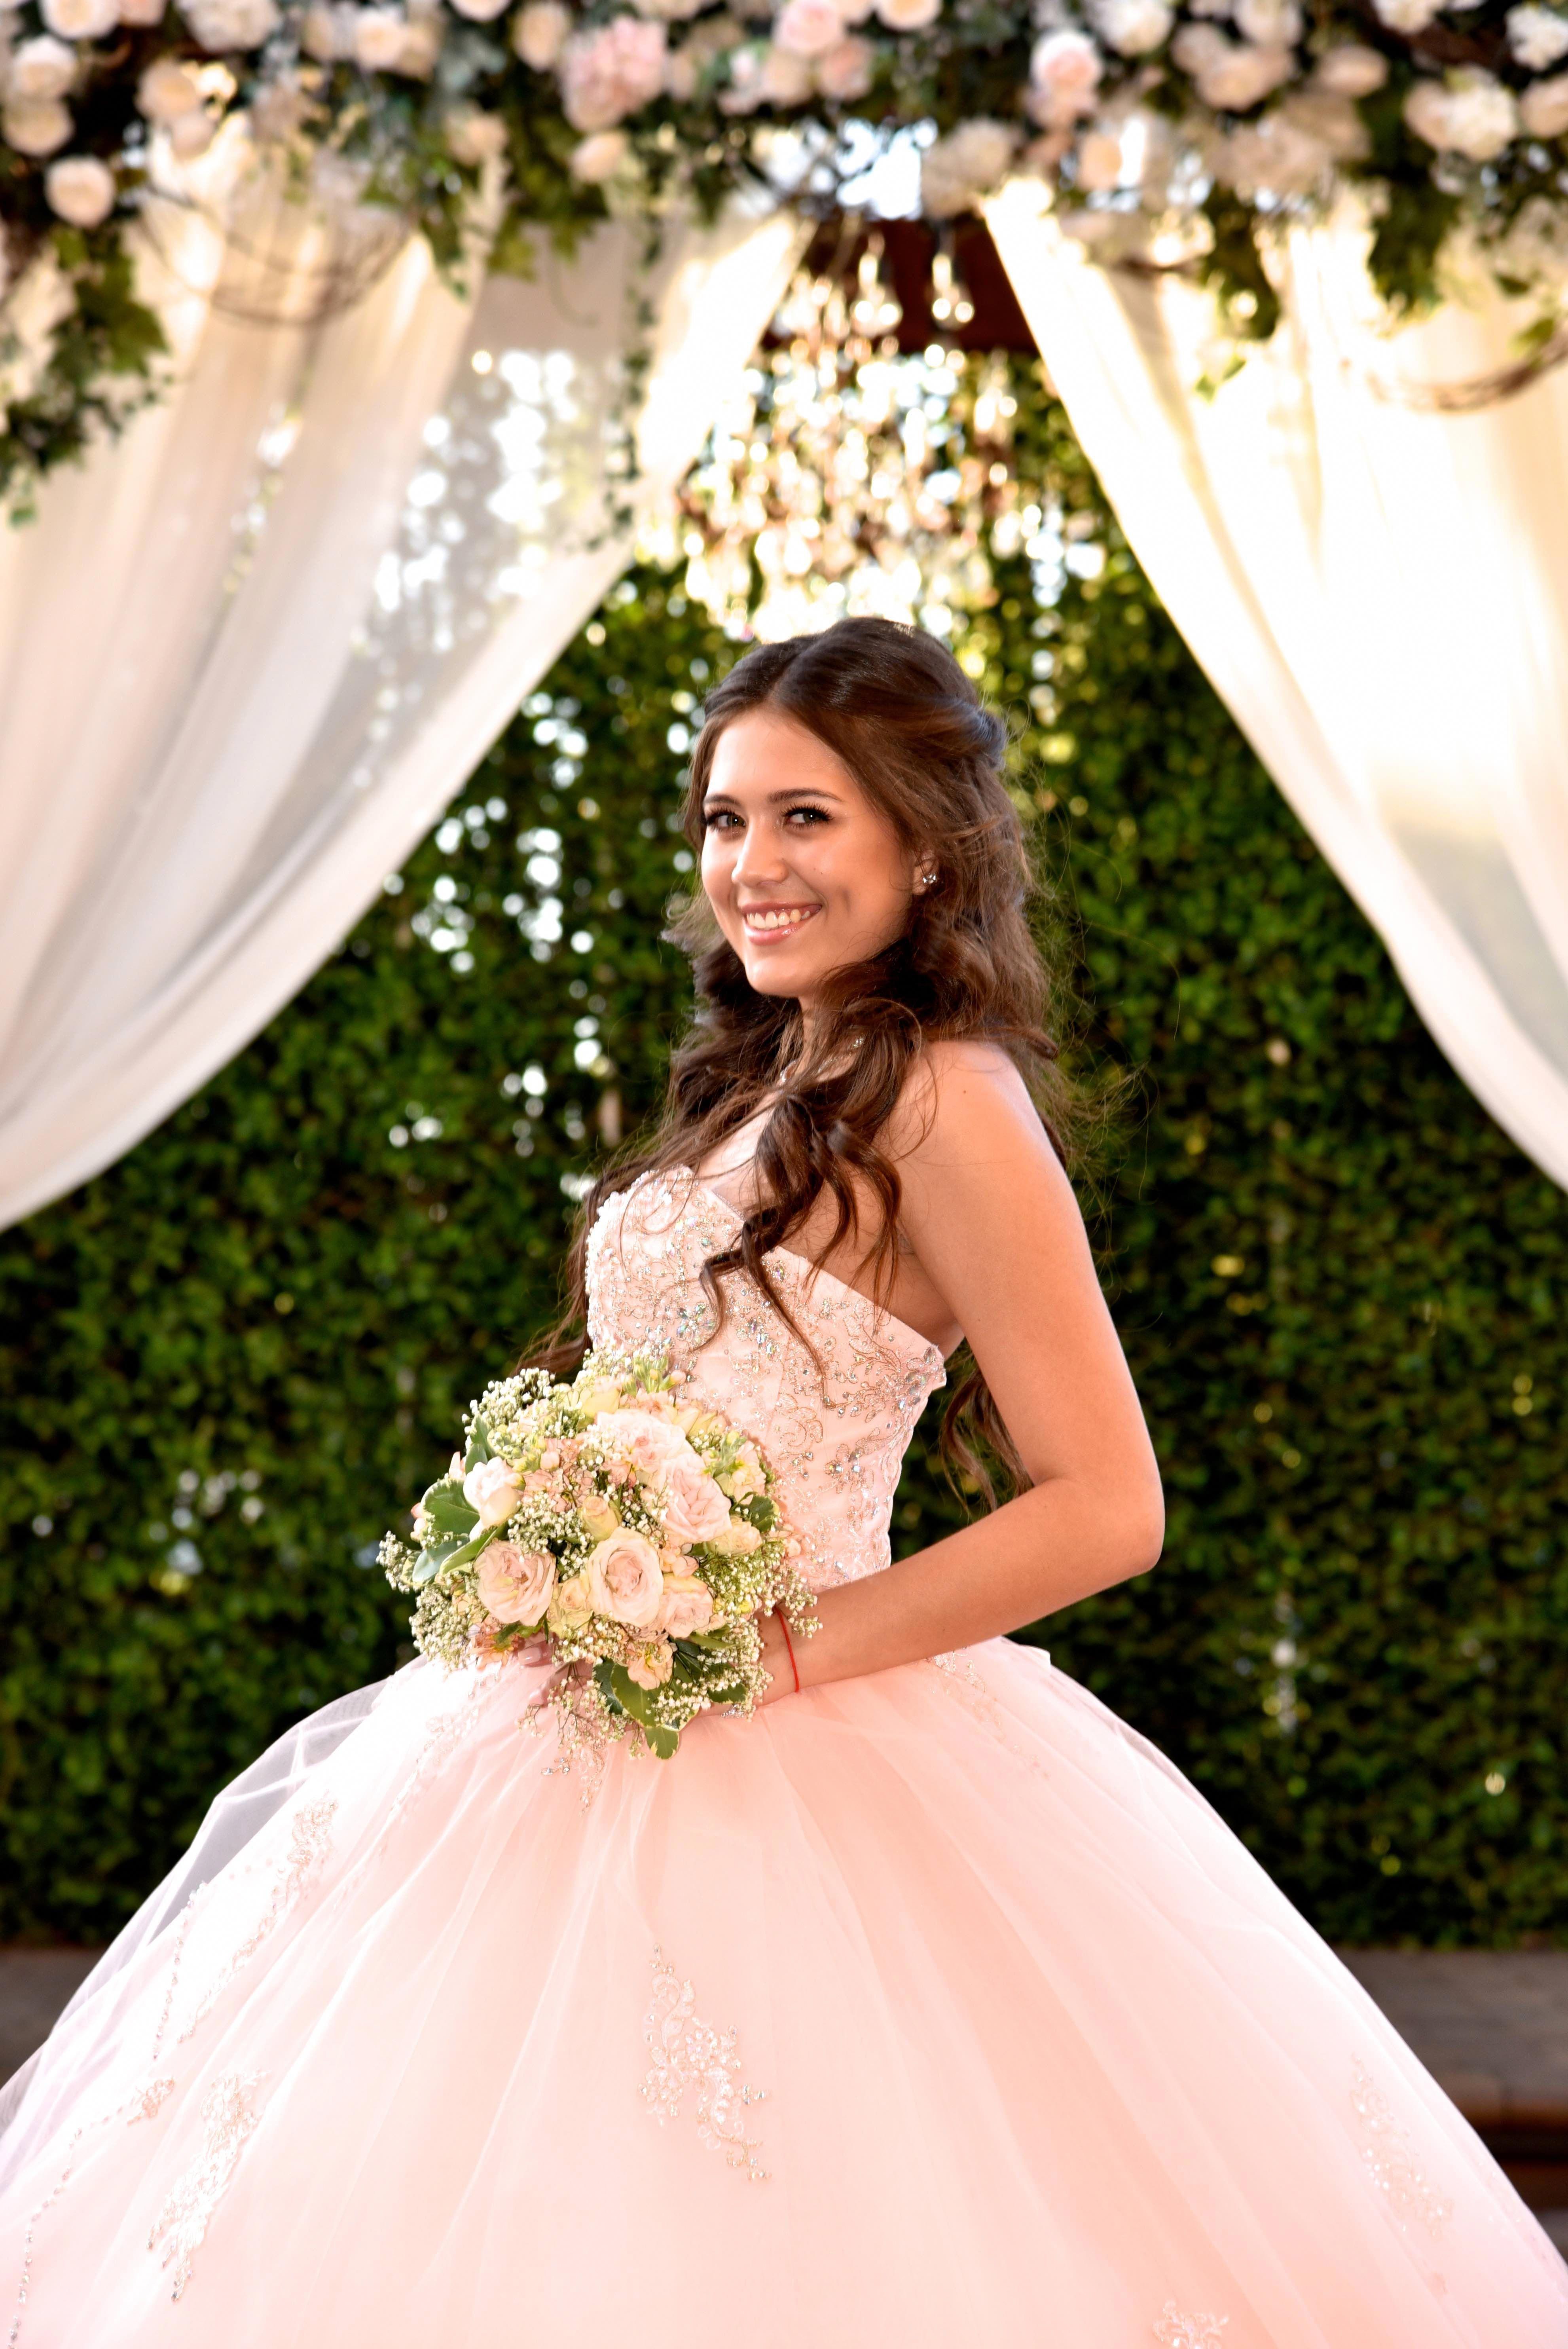 Versatile Quinceanera Dresses Look Here Quinceanera Dresses Pink Quinceanera Dresses Quinceanera Hairstyles